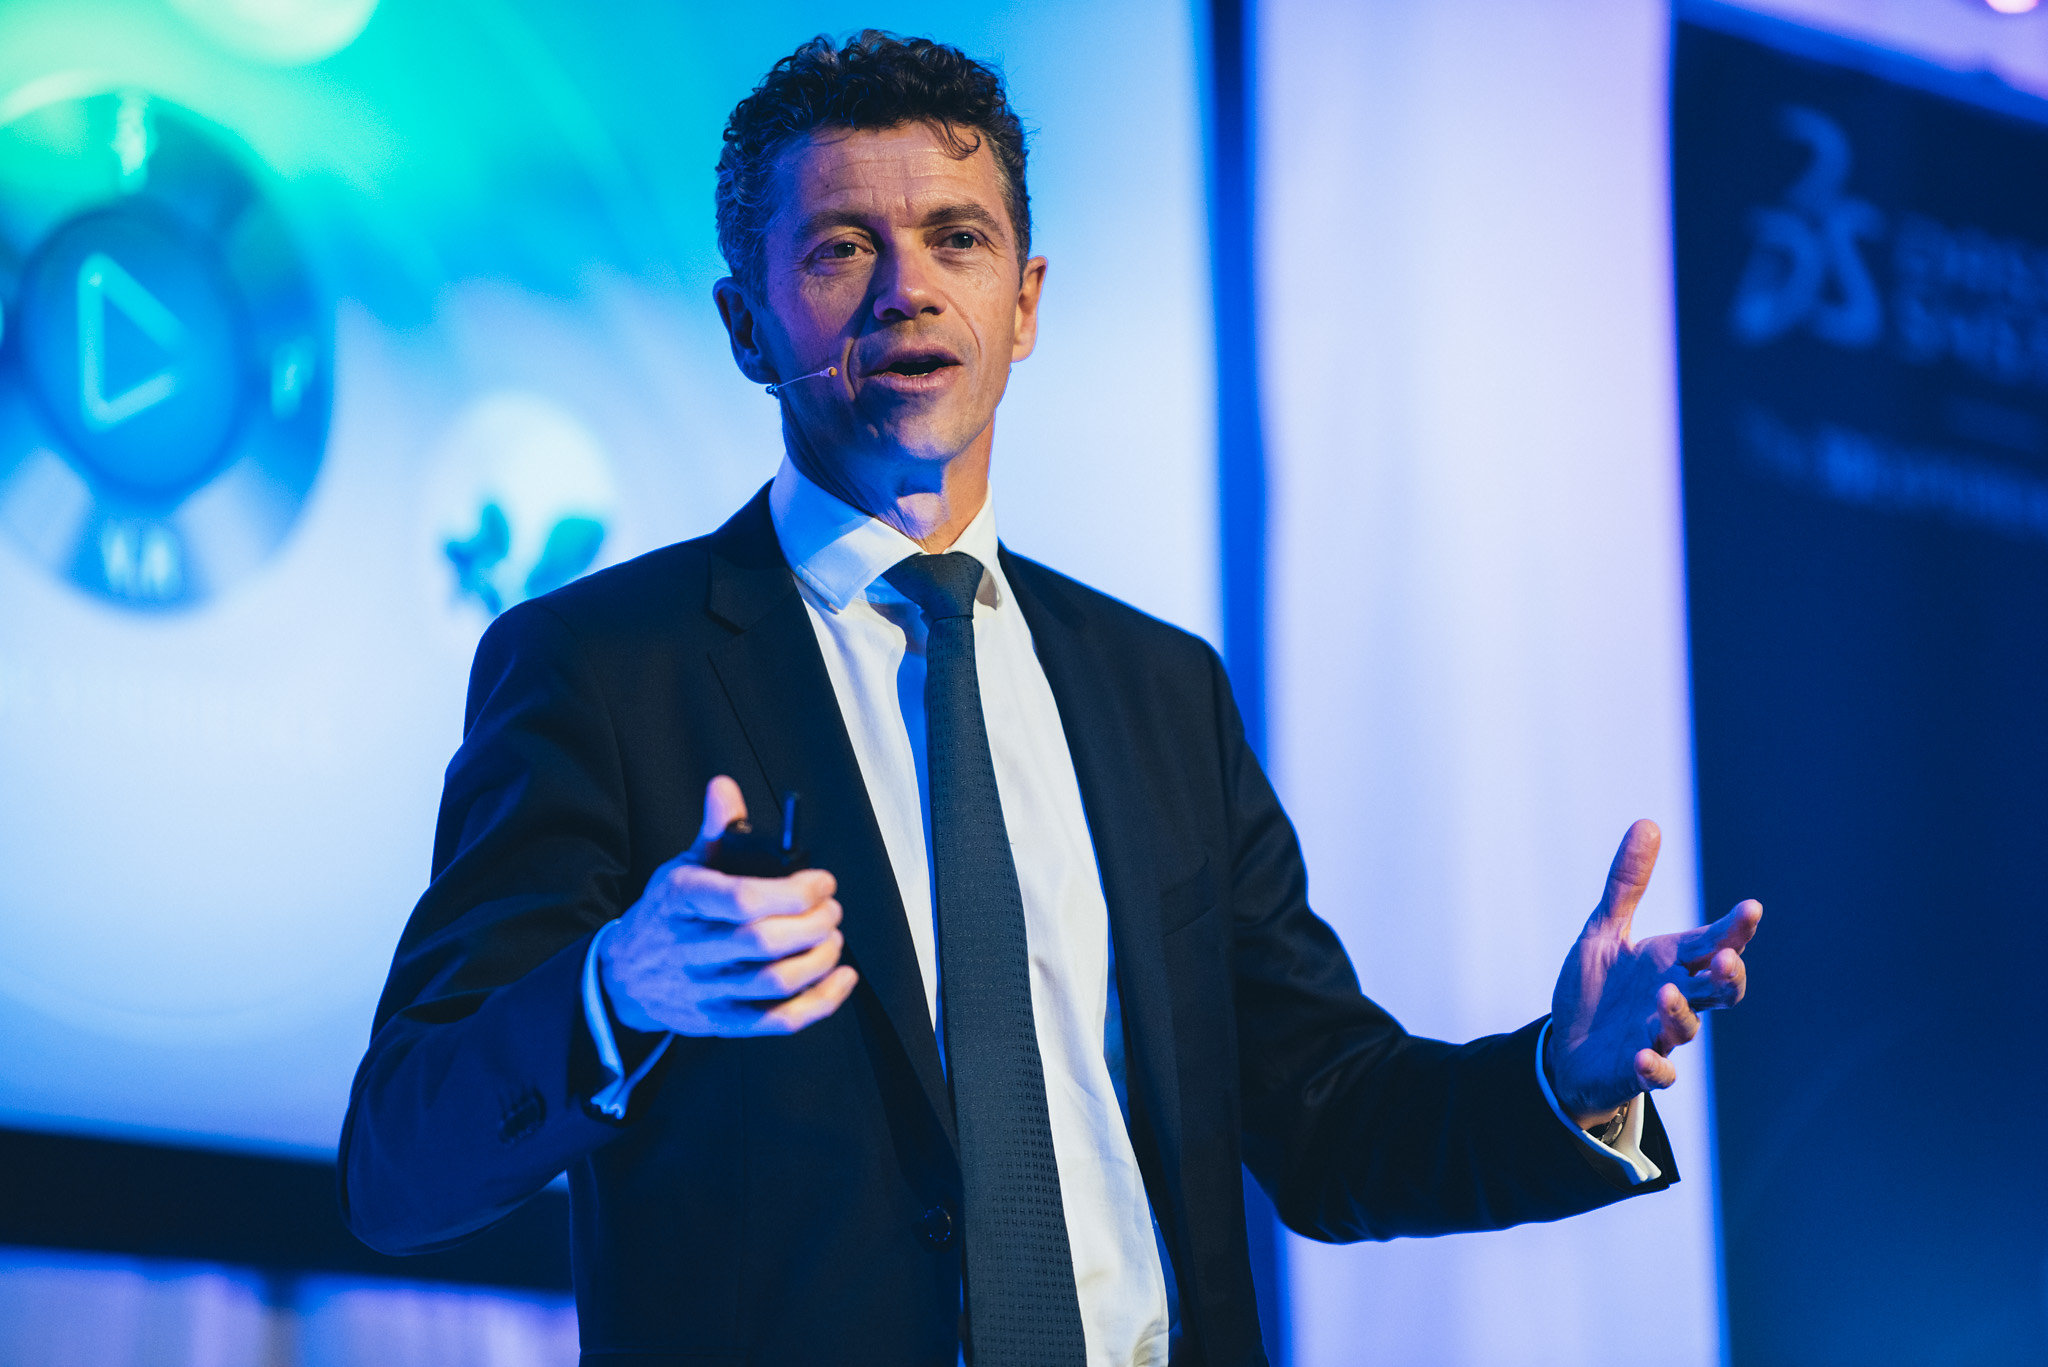 3DX_forum_event_highlights_rotterdam_presentations-23.jpg